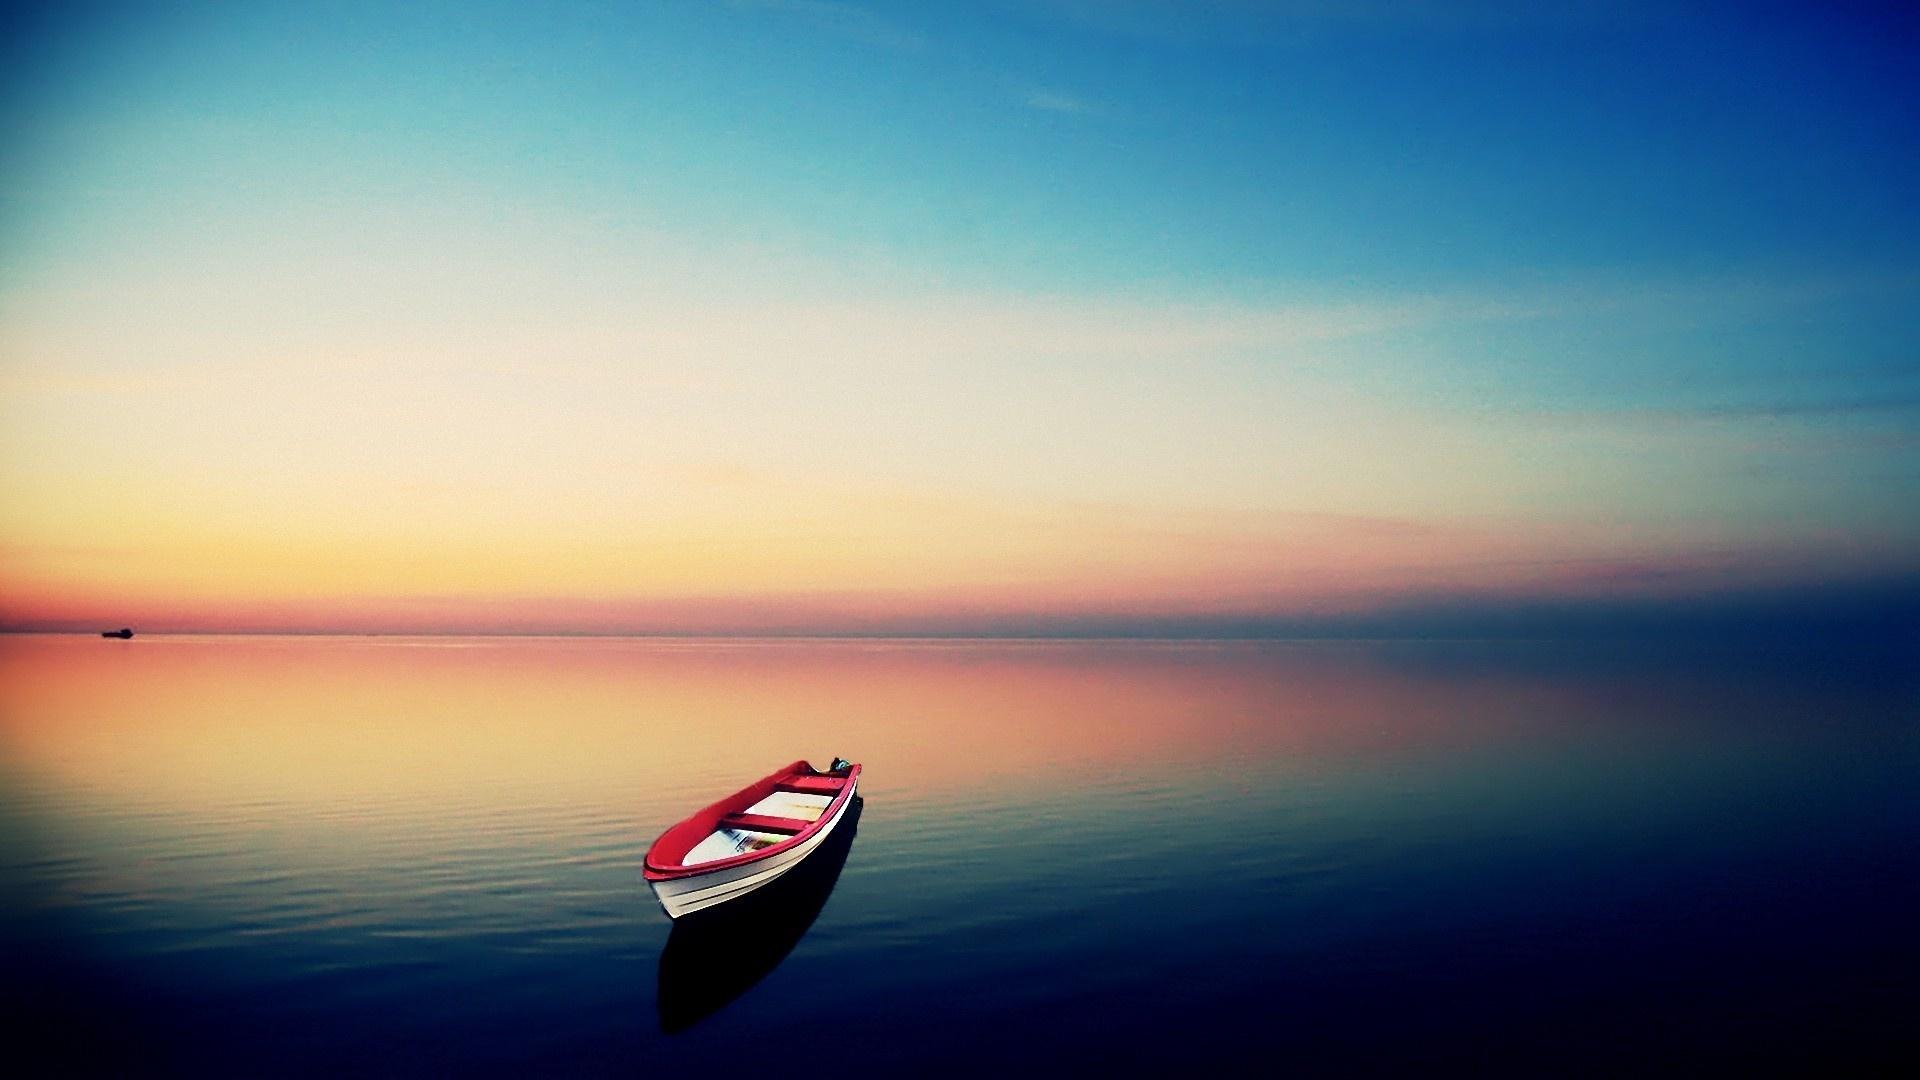 Boat Wallpaper